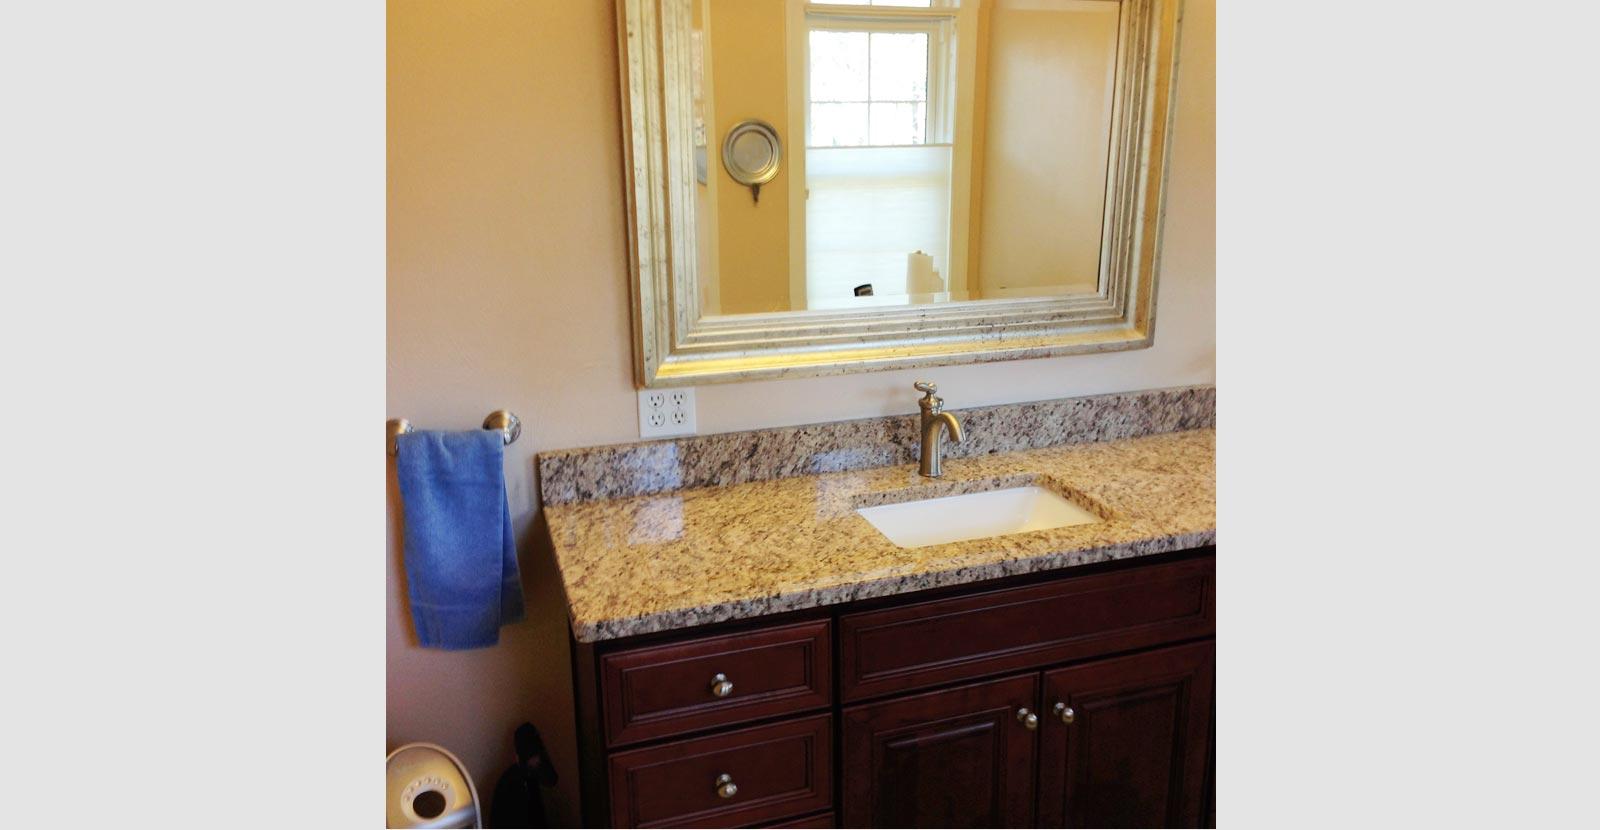 Bathroom Remodeling Hampton RoadsLewis Bathroom Remodel Hatchett - Hatchett bathroom remodel